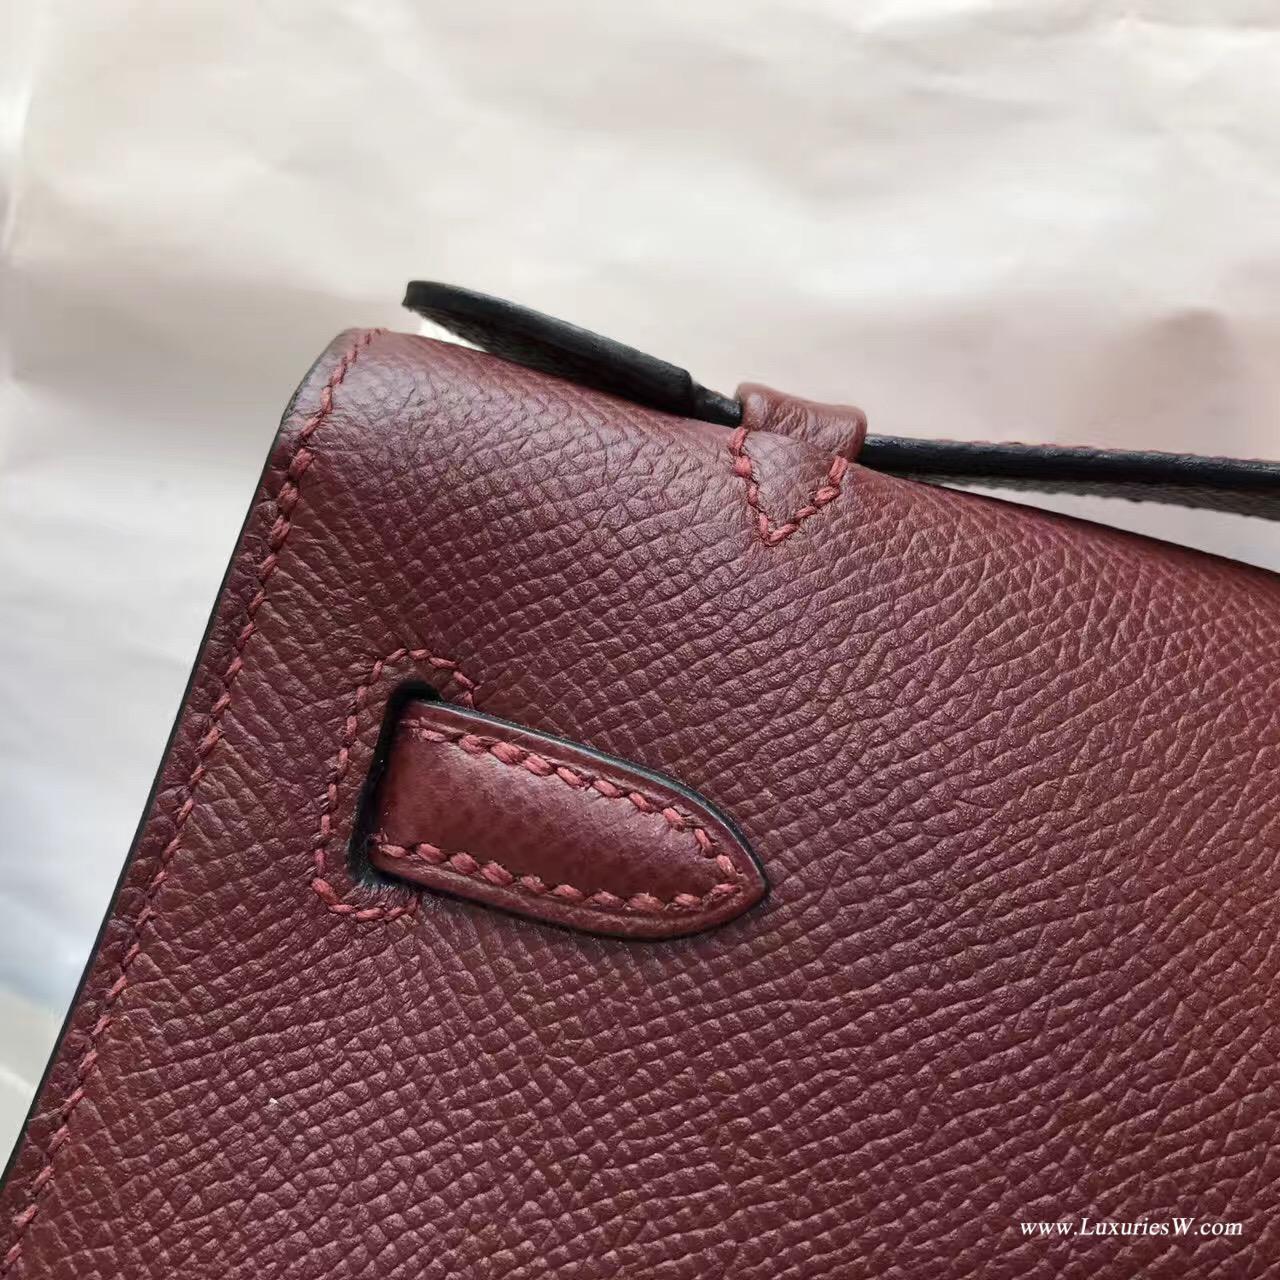 Hermes Mini Kelly Epsom 愛馬仕紅CK55 Rouge 紅色最有代表性顏色 金扣